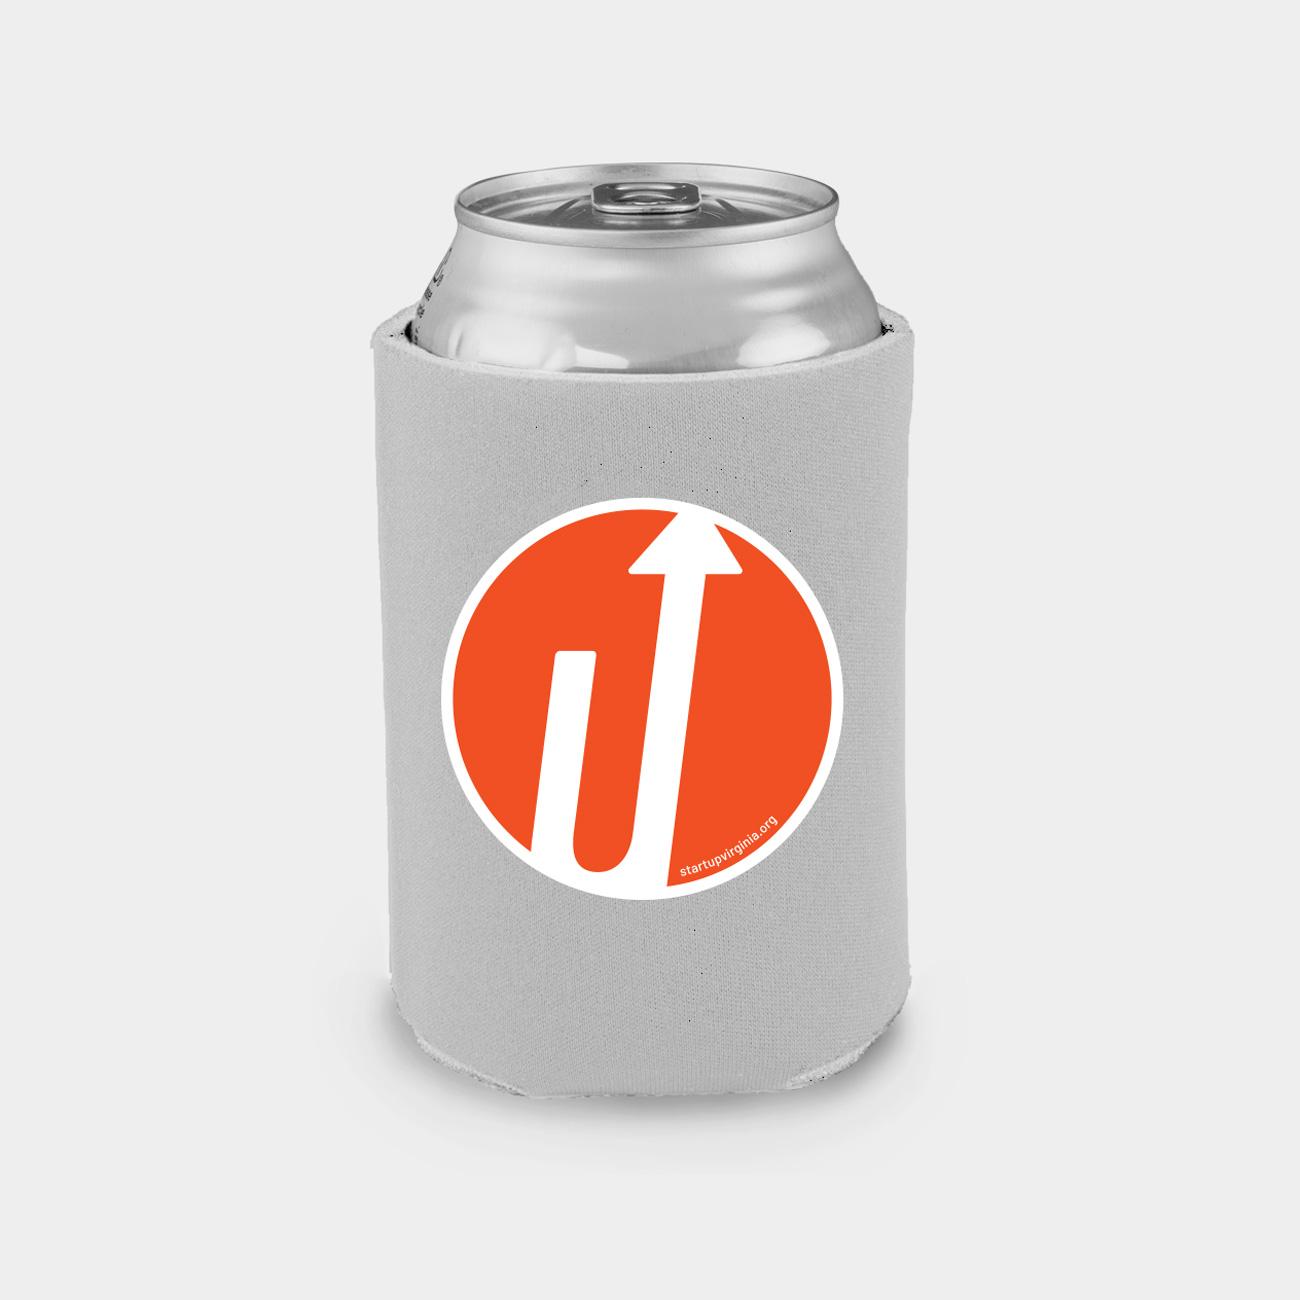 Beer koozie with logo